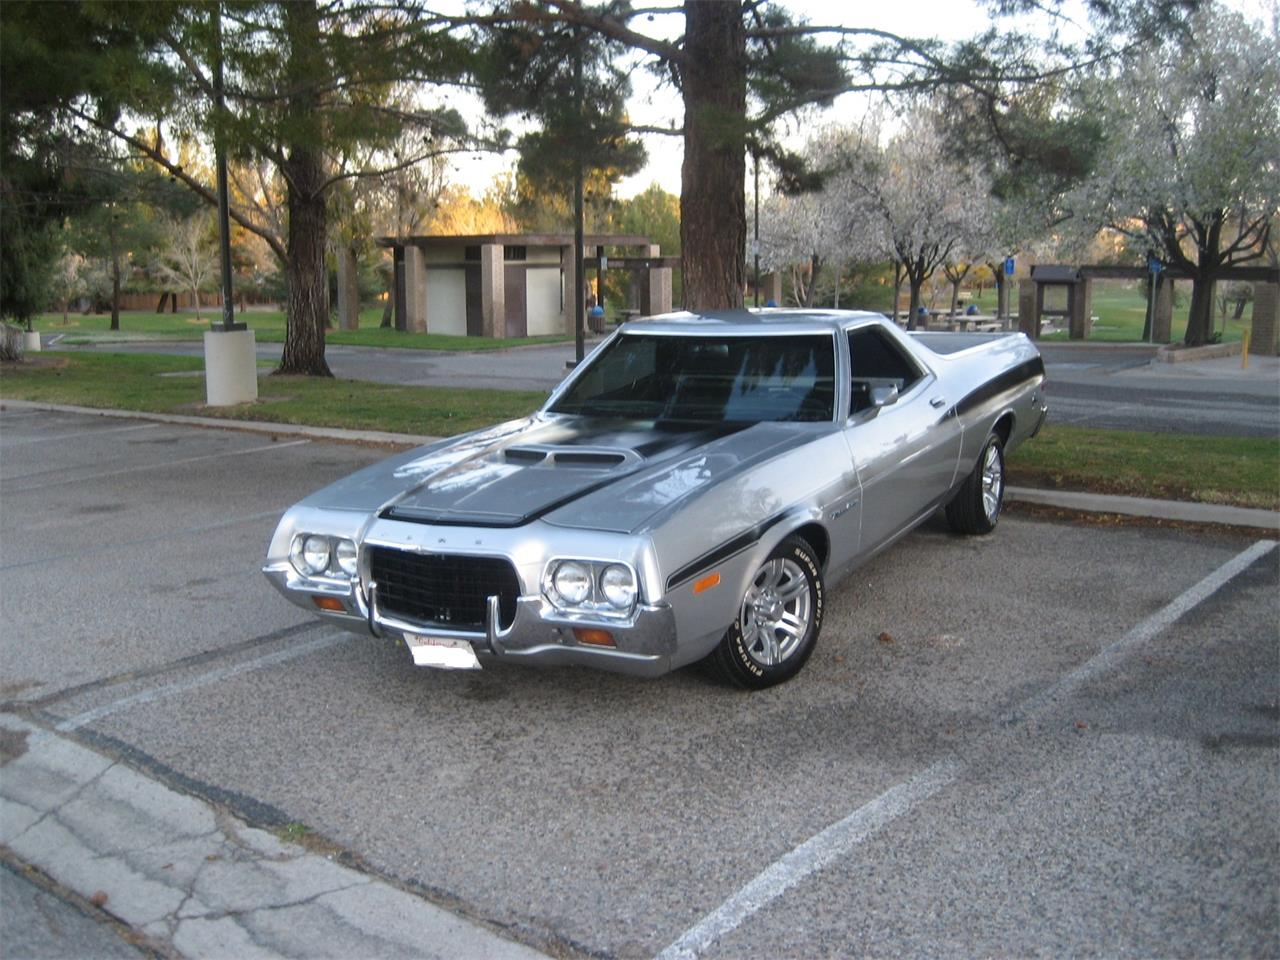 1972 Ford Ranchero for Sale | ClassicCars.com | CC-1088639